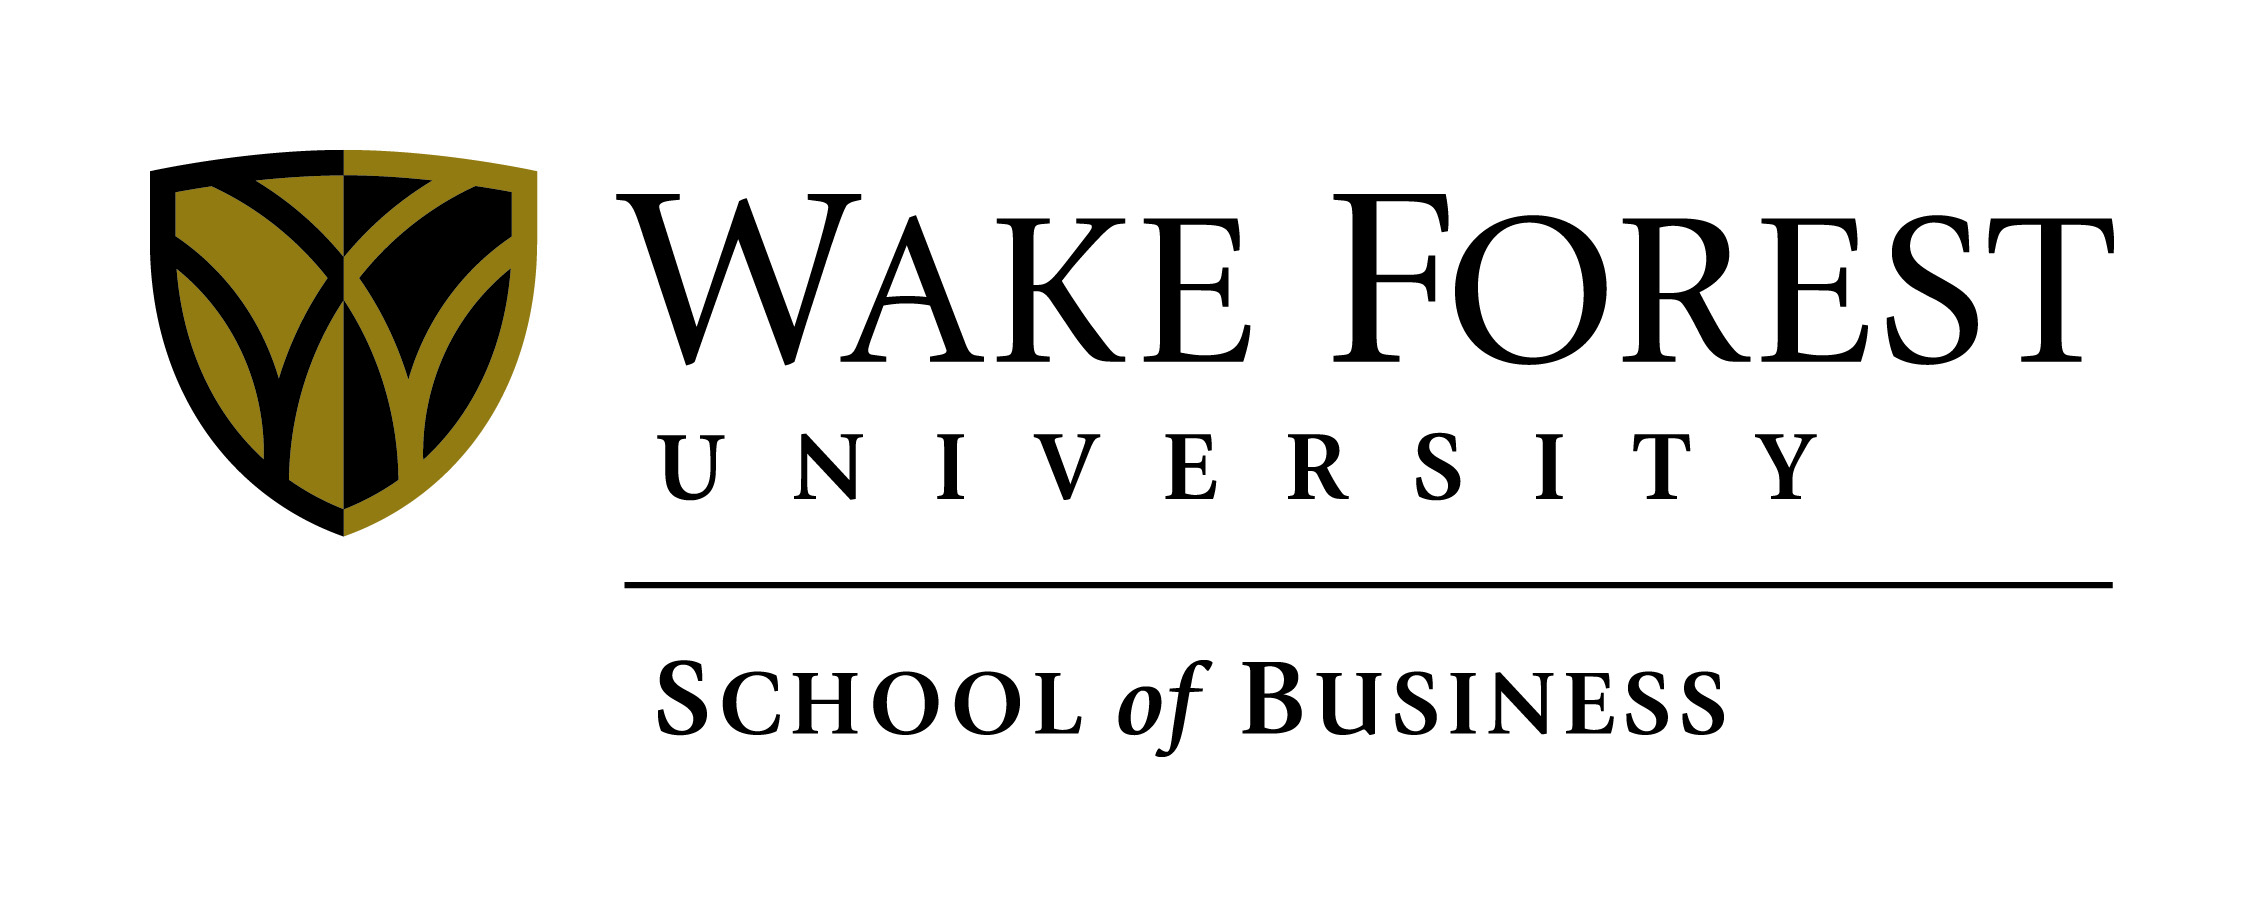 WFU_Business_H_CMYK